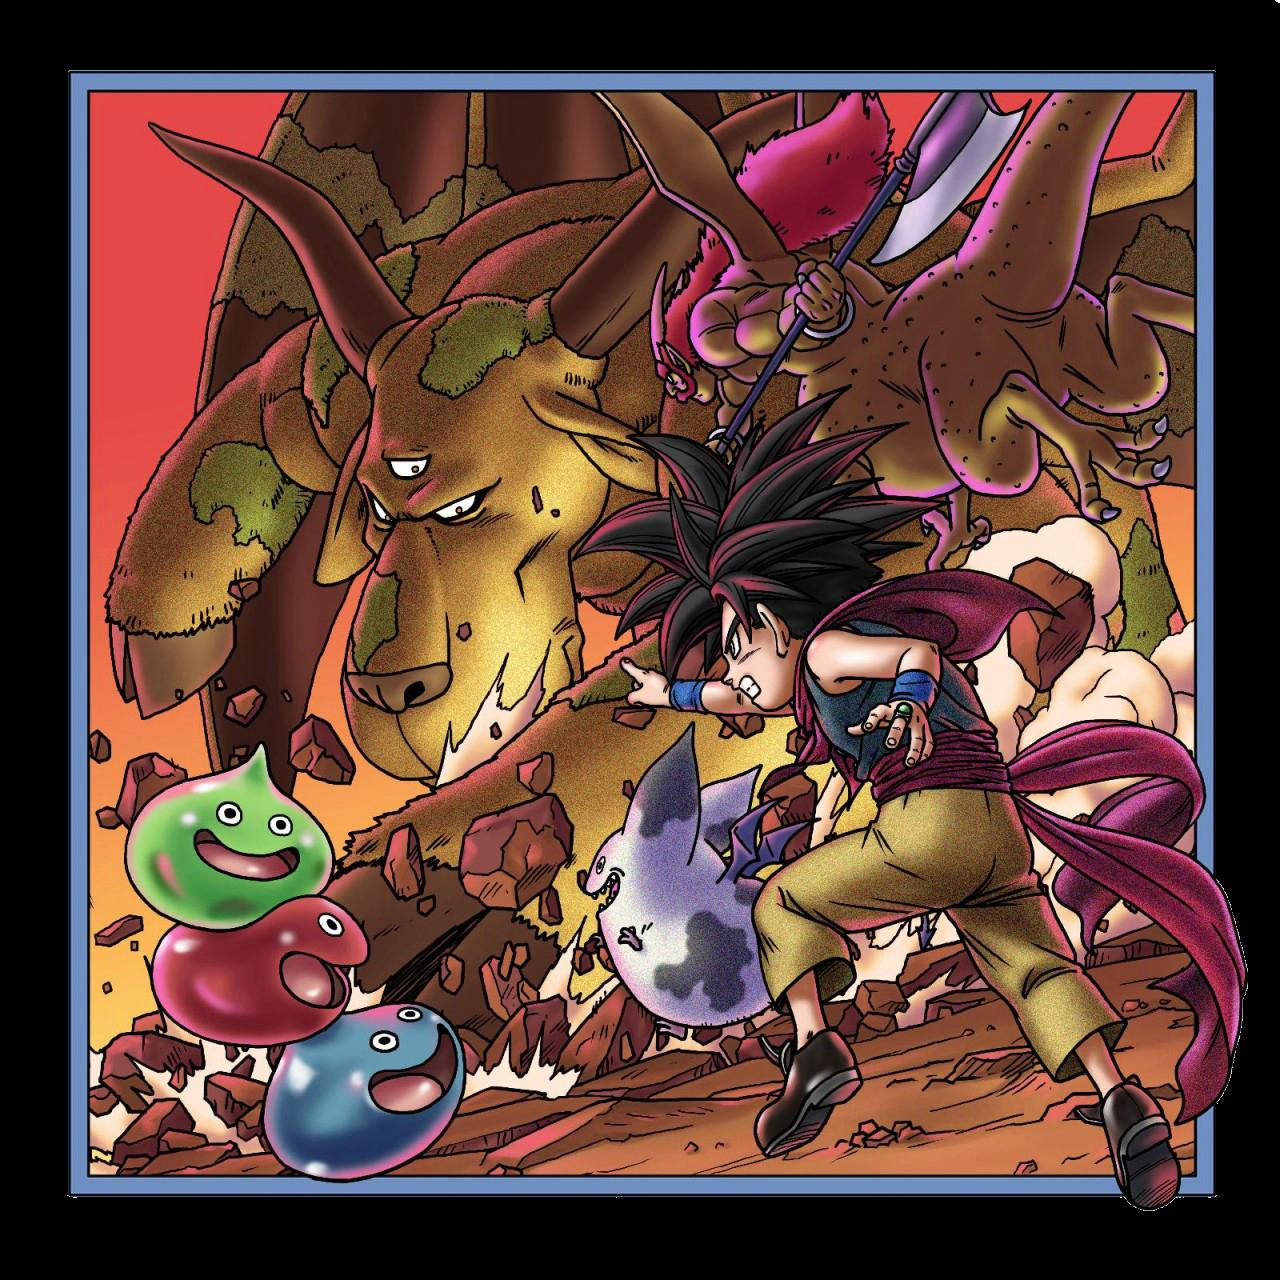 Dragon Quest Wikipedia: Patxi El Giganchivo